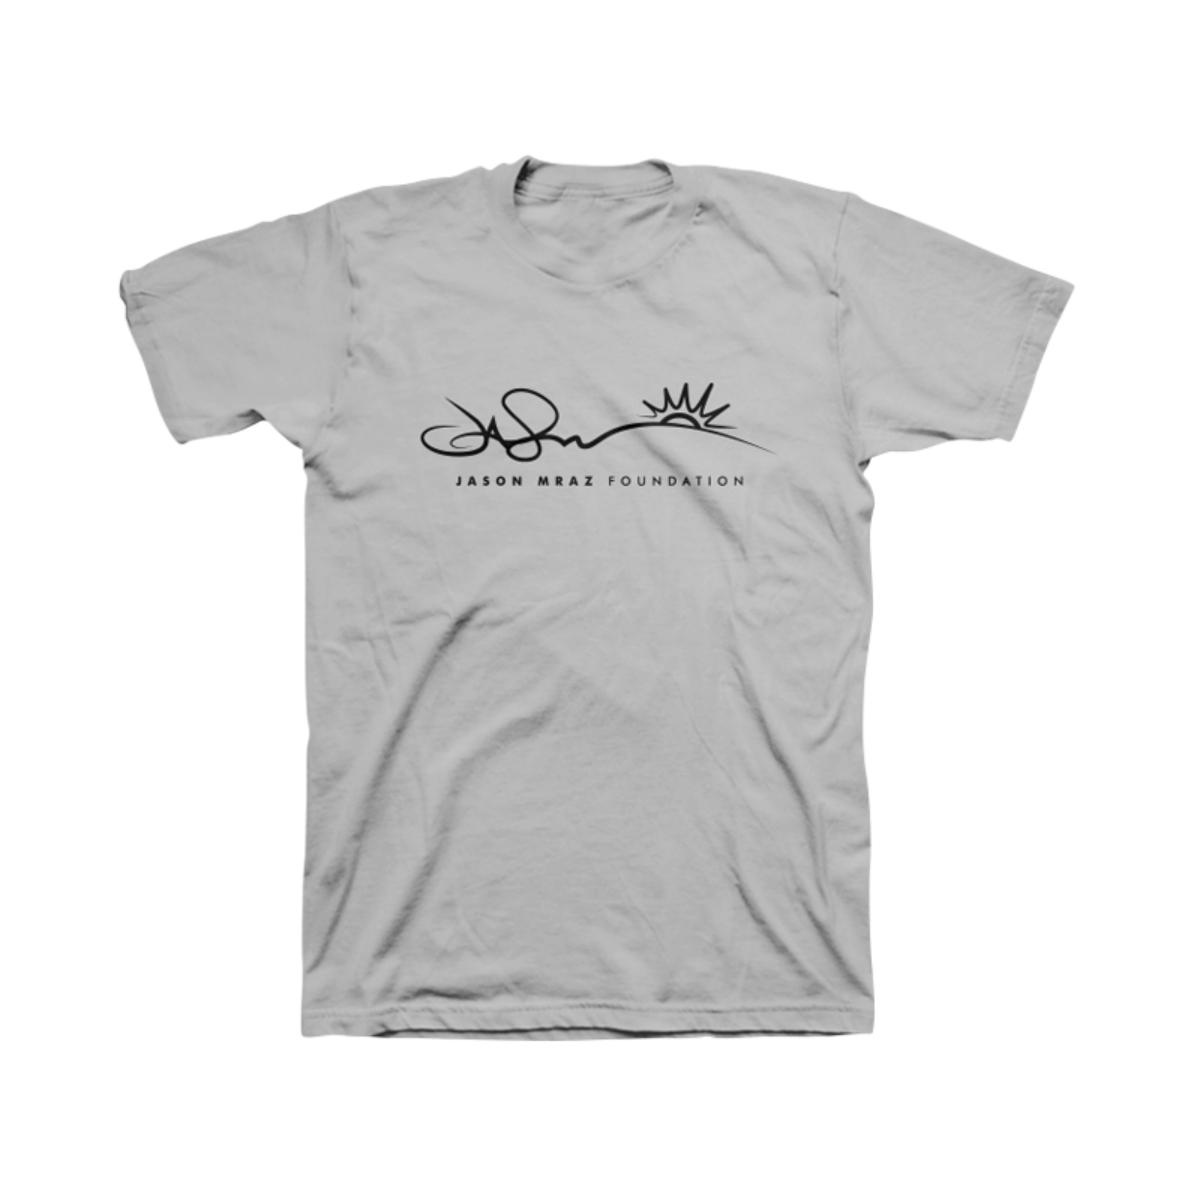 Jason Mraz Foundation T-shirt